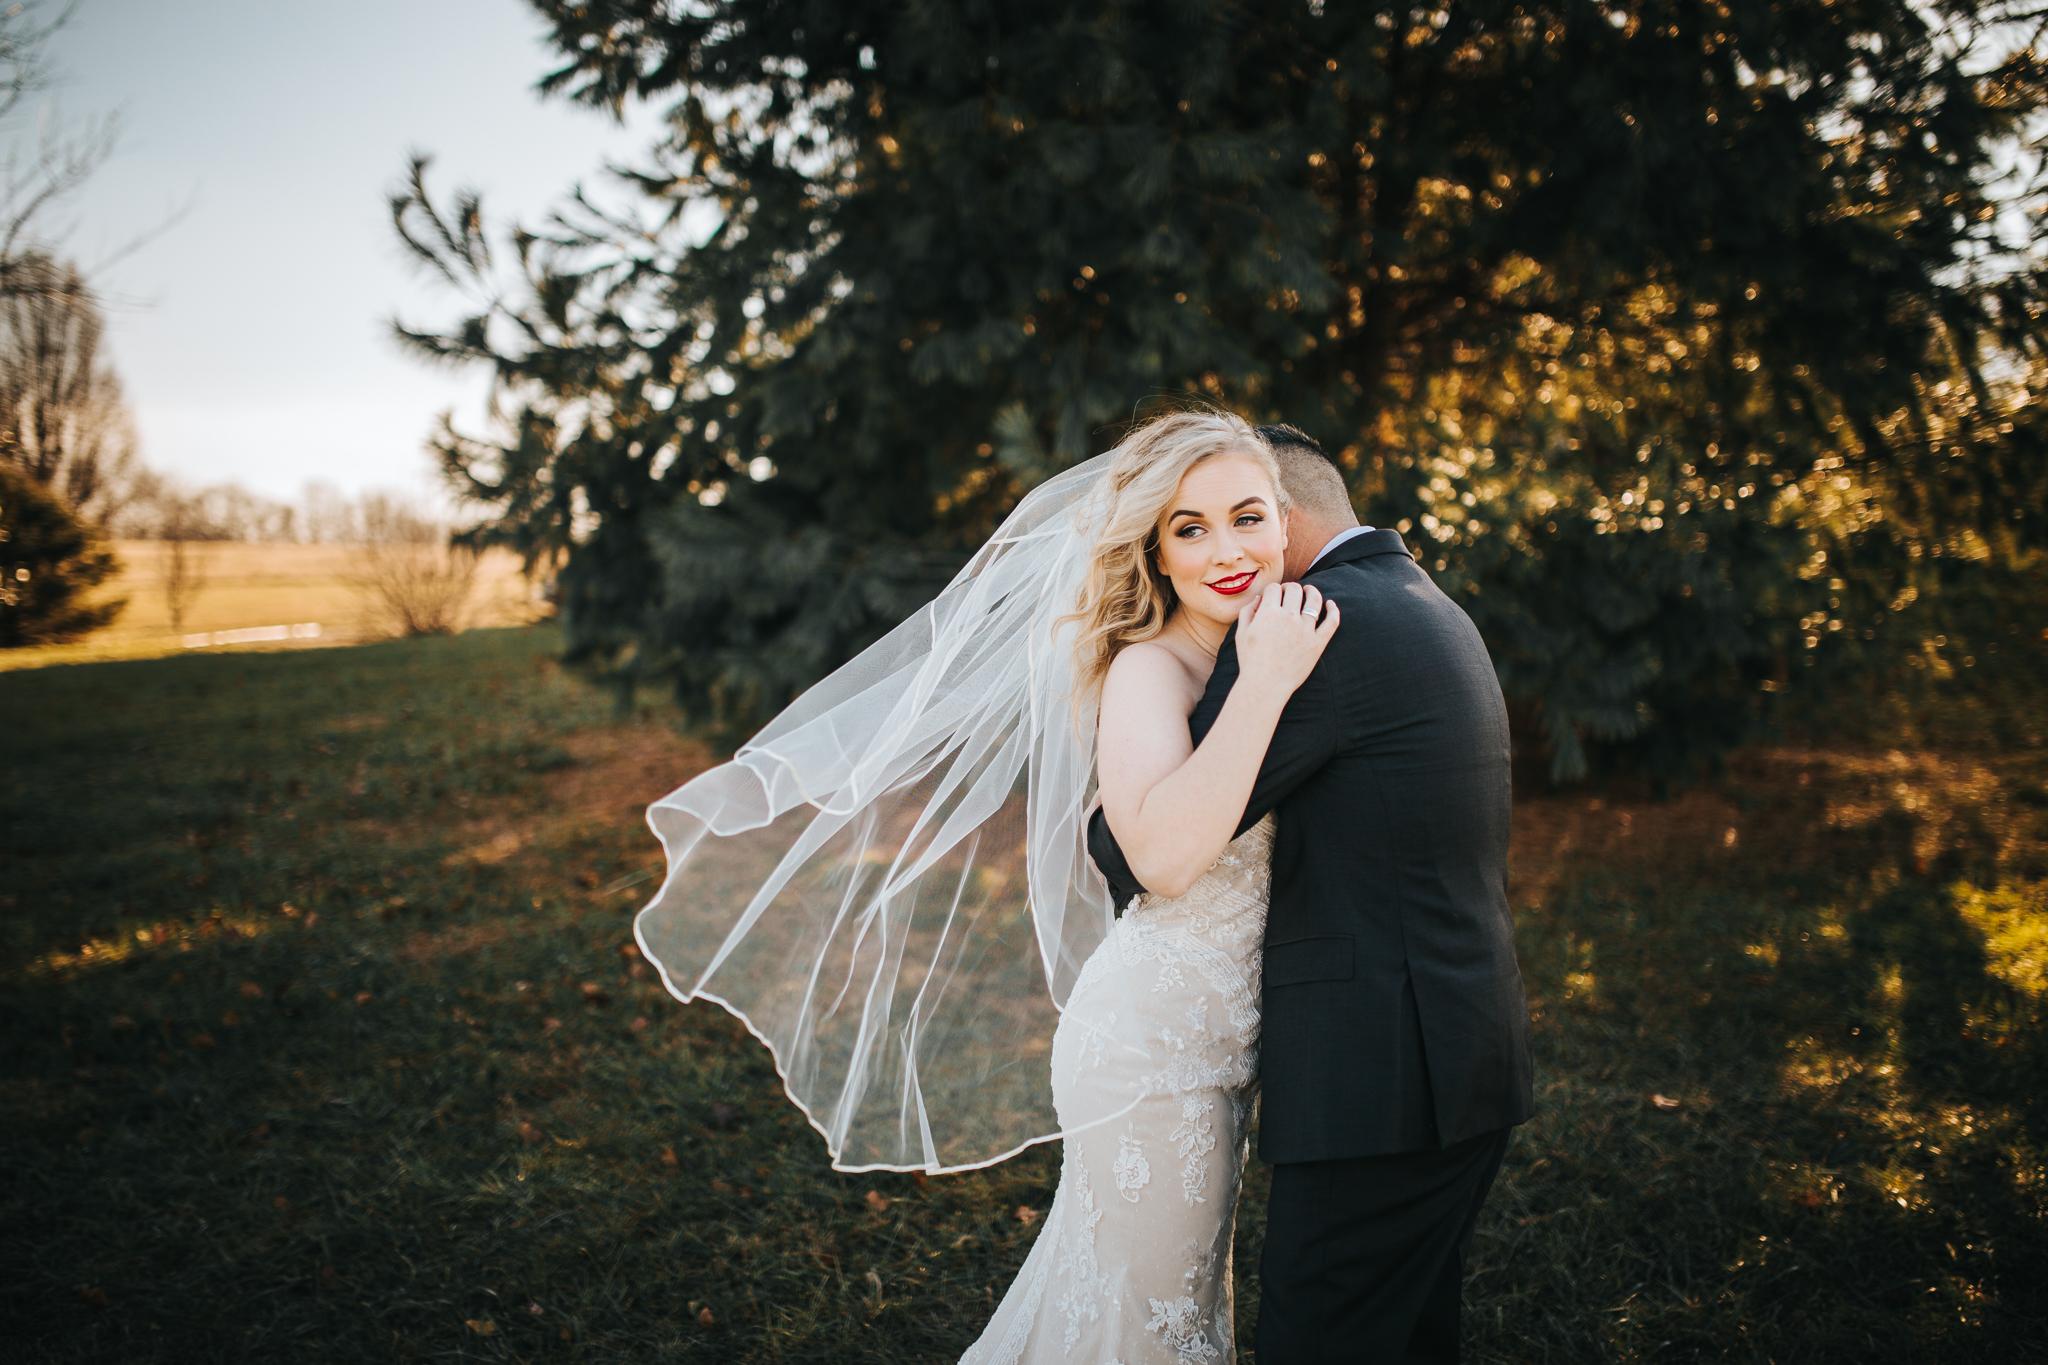 0048 Ariana Jordan Photo - Cameron & Lauren's Wedding at Talon Winery  6168.jpg